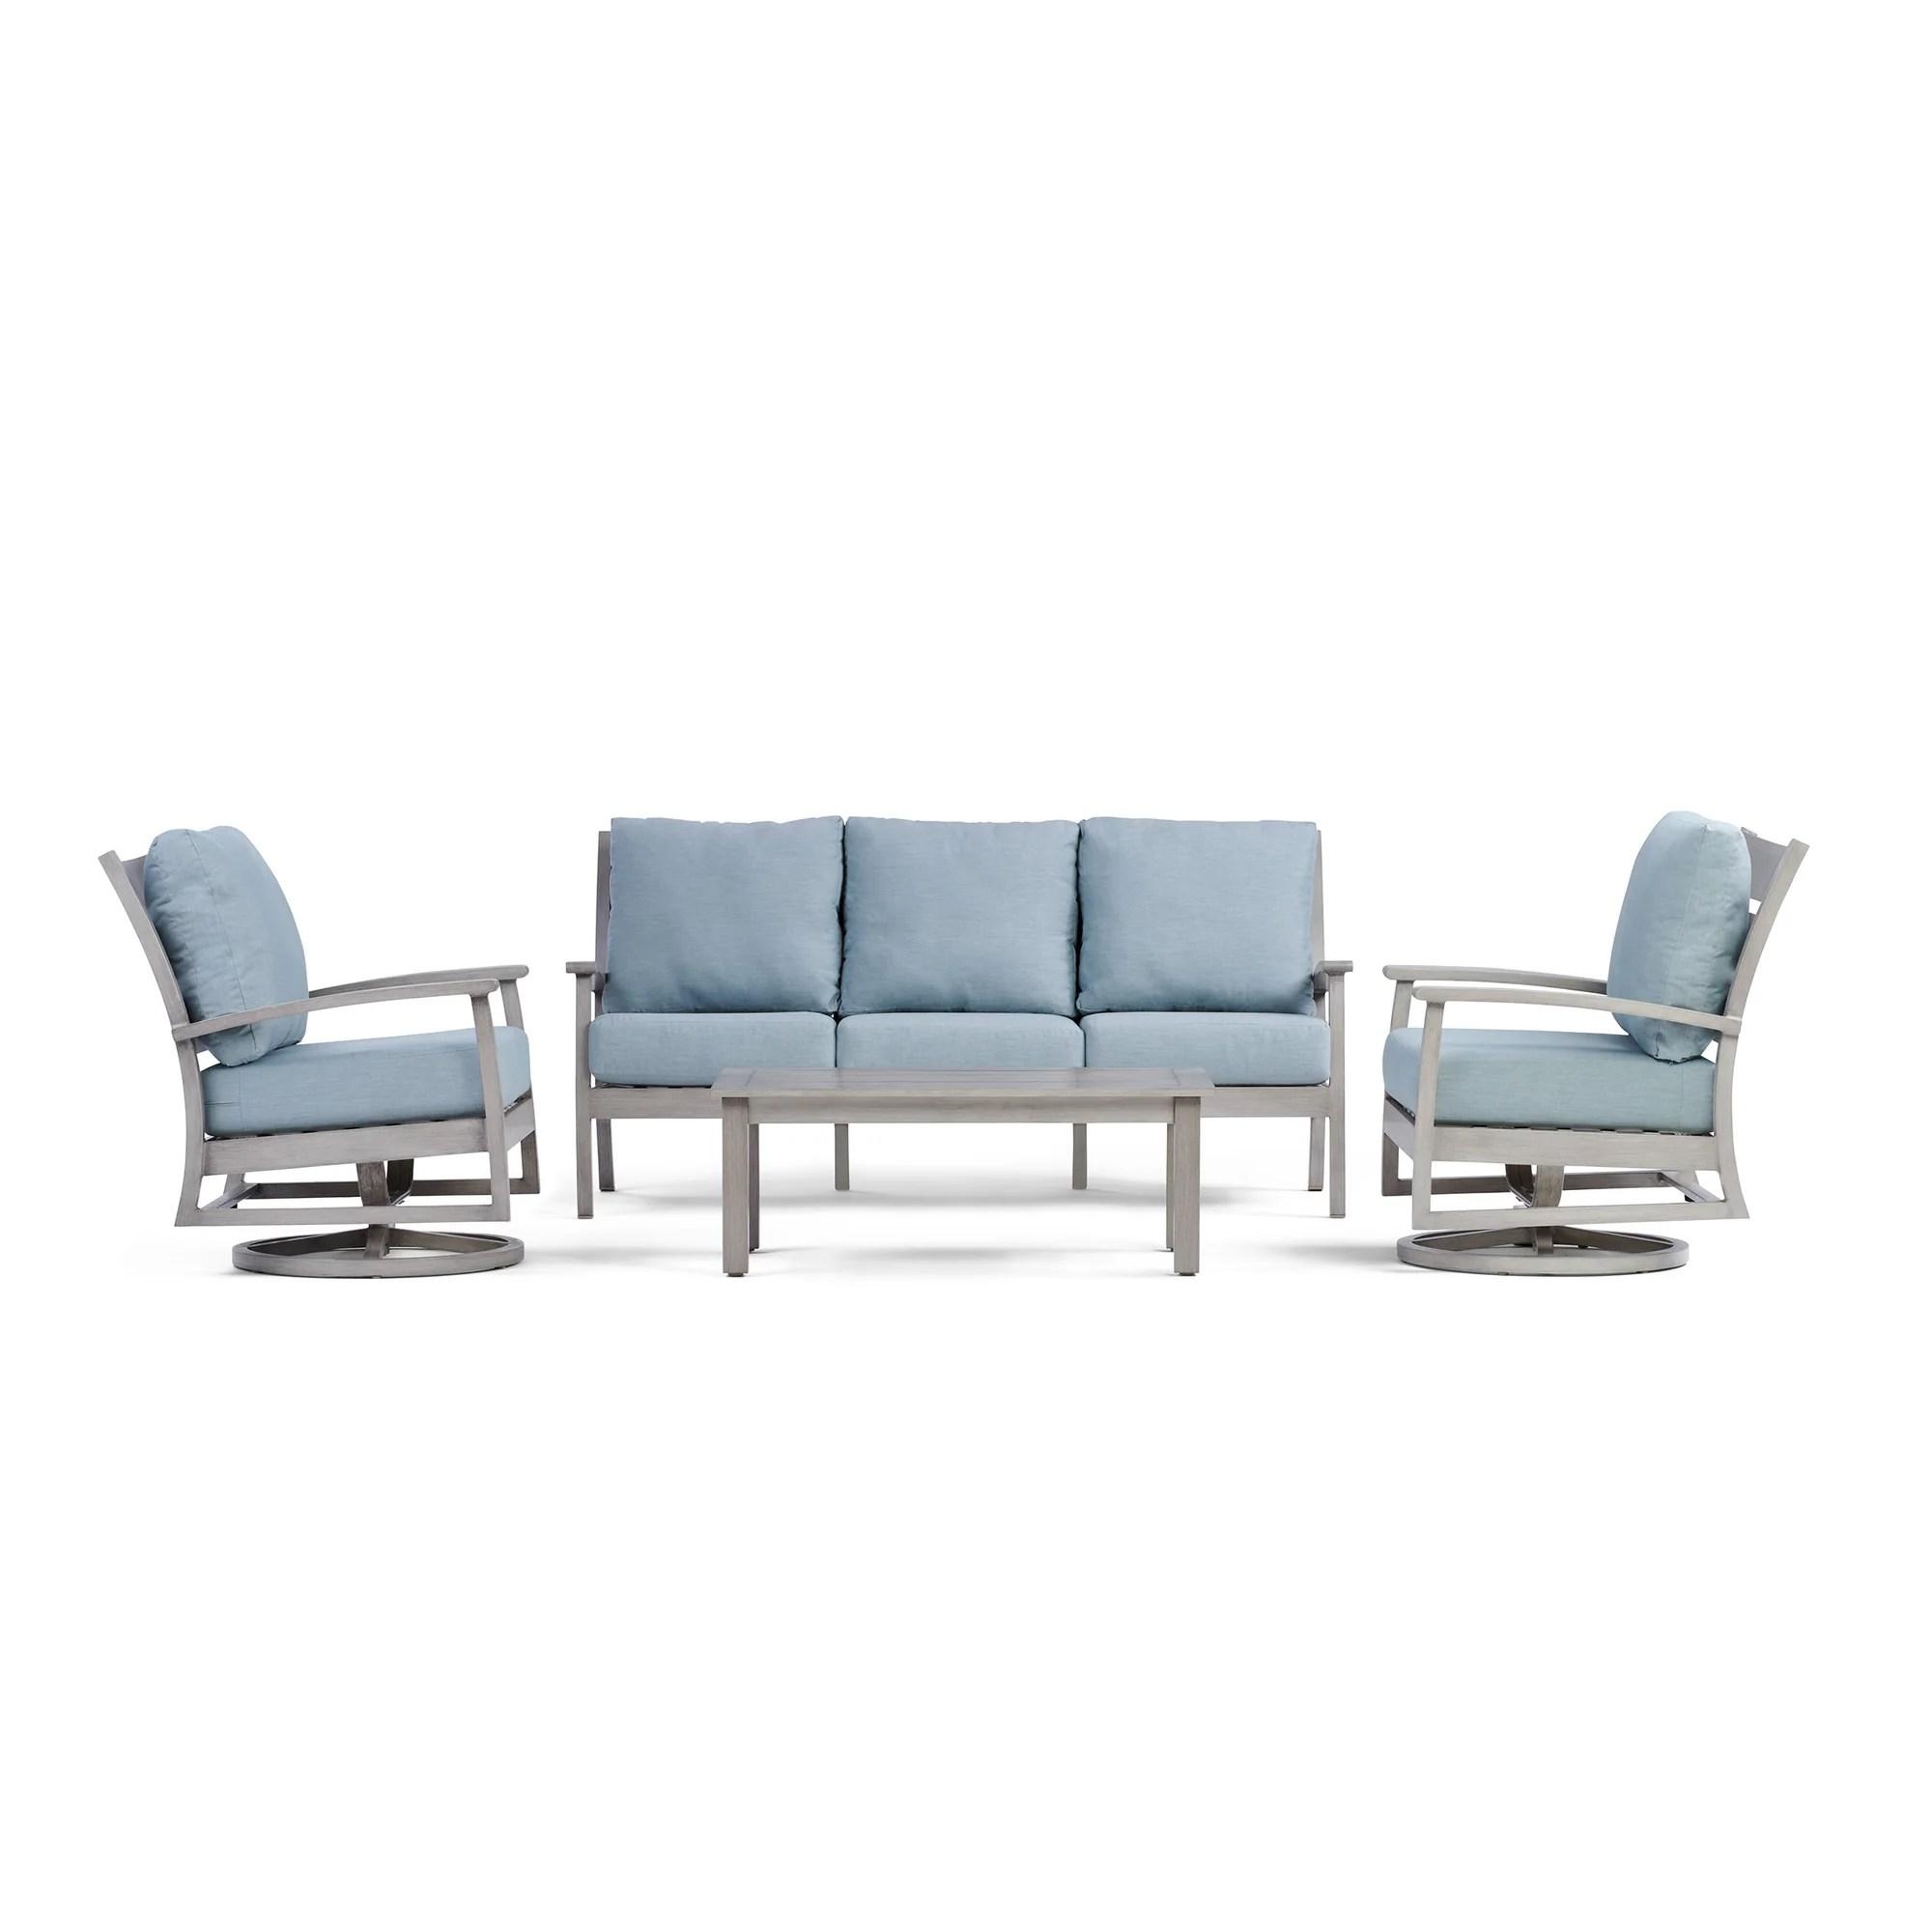 swivel chair sofa set nfl bean bag chairs eden outdoor with yardbird furniture